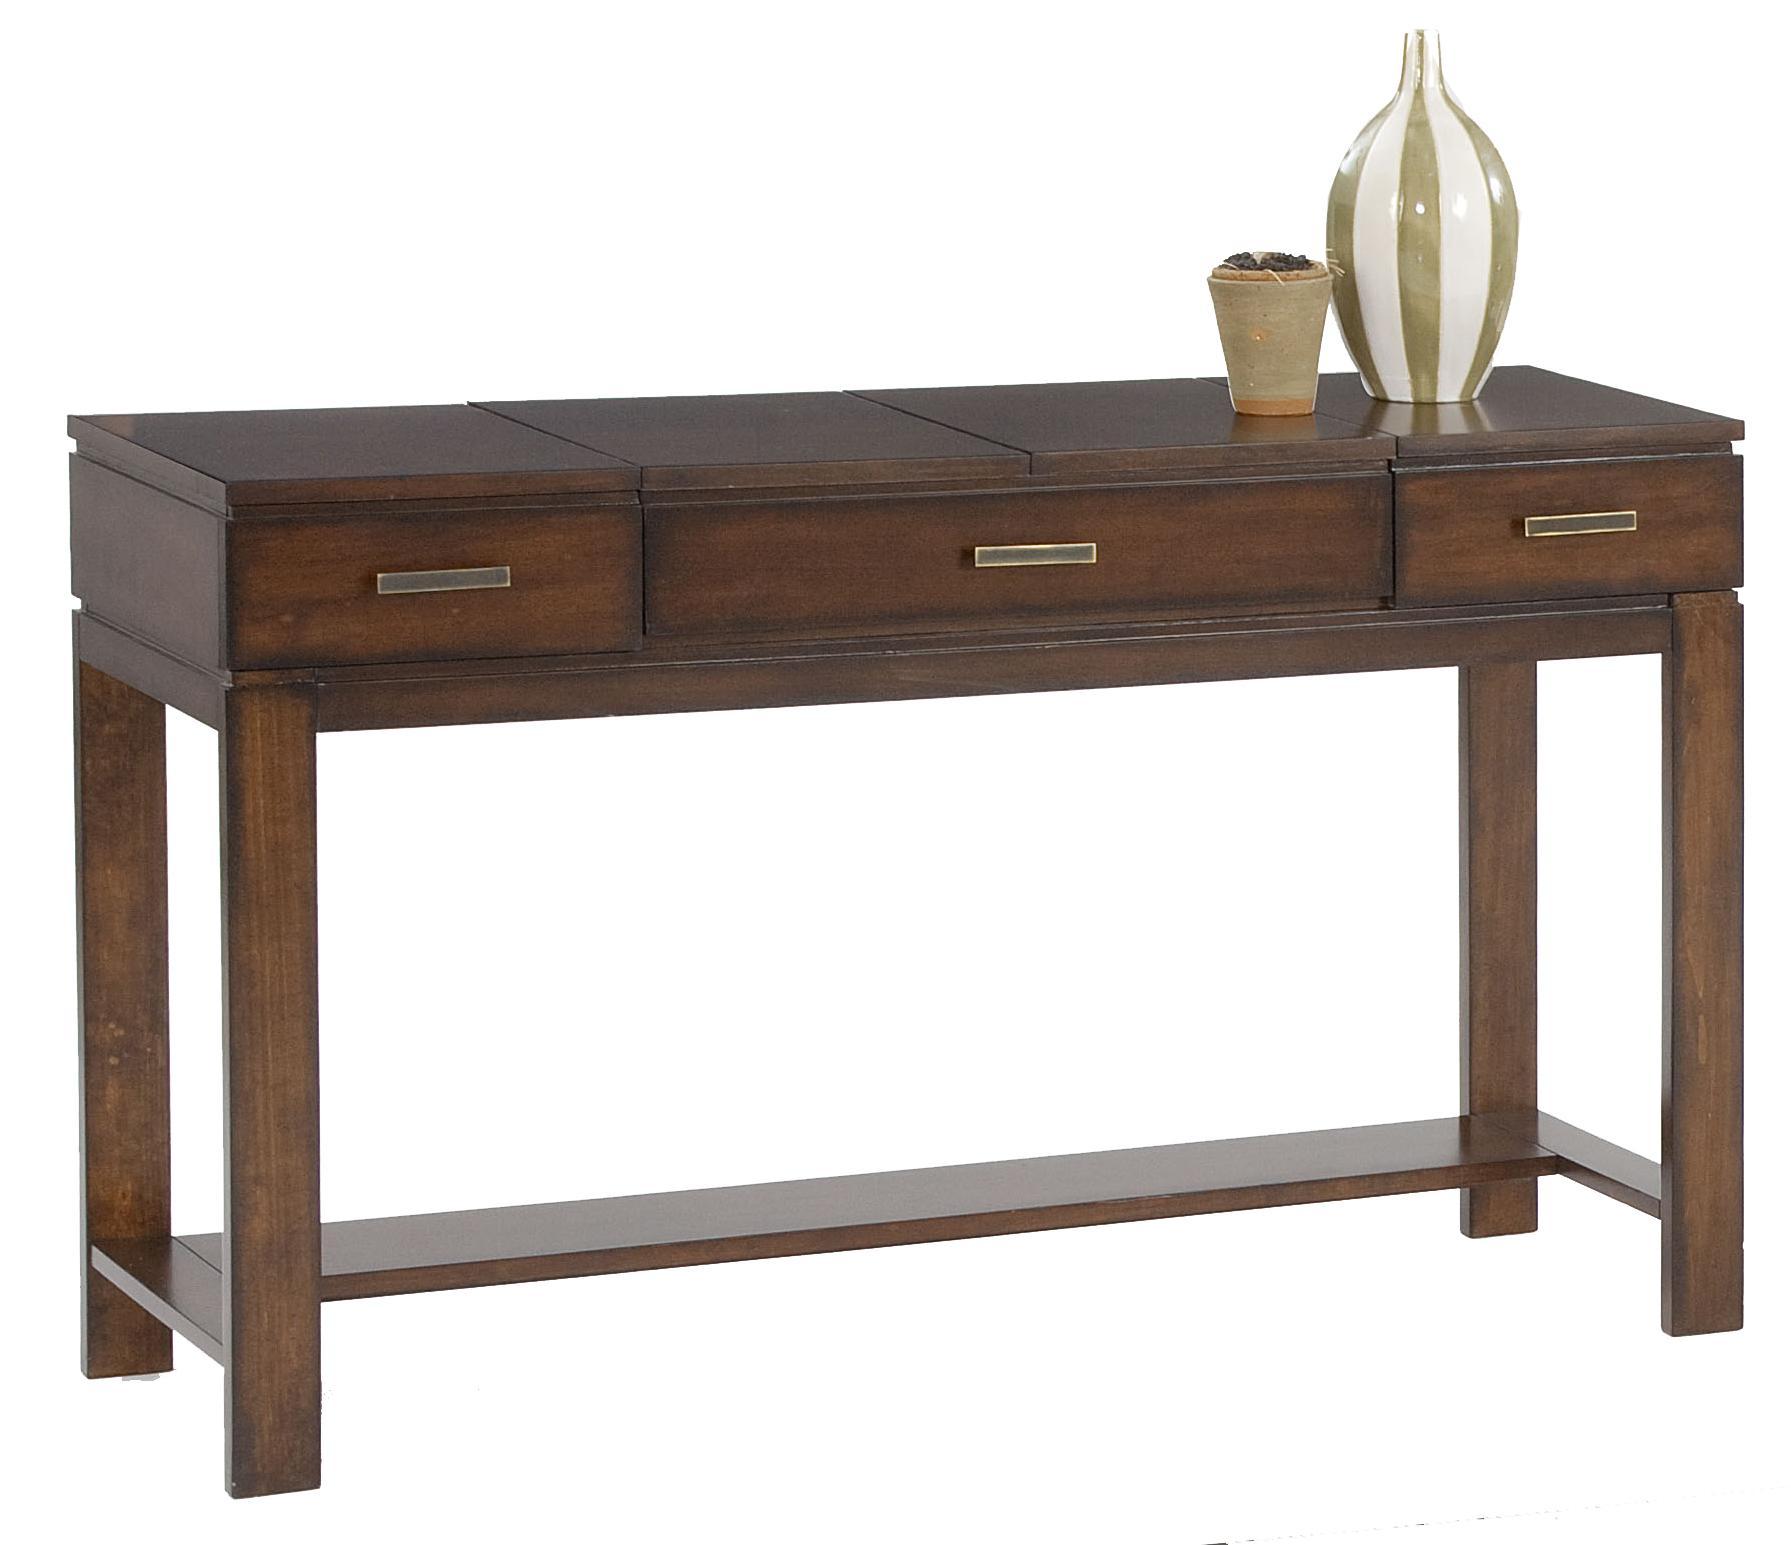 Progressive Furniture Miramar Sofa Table / Desk - Item Number: P412-05